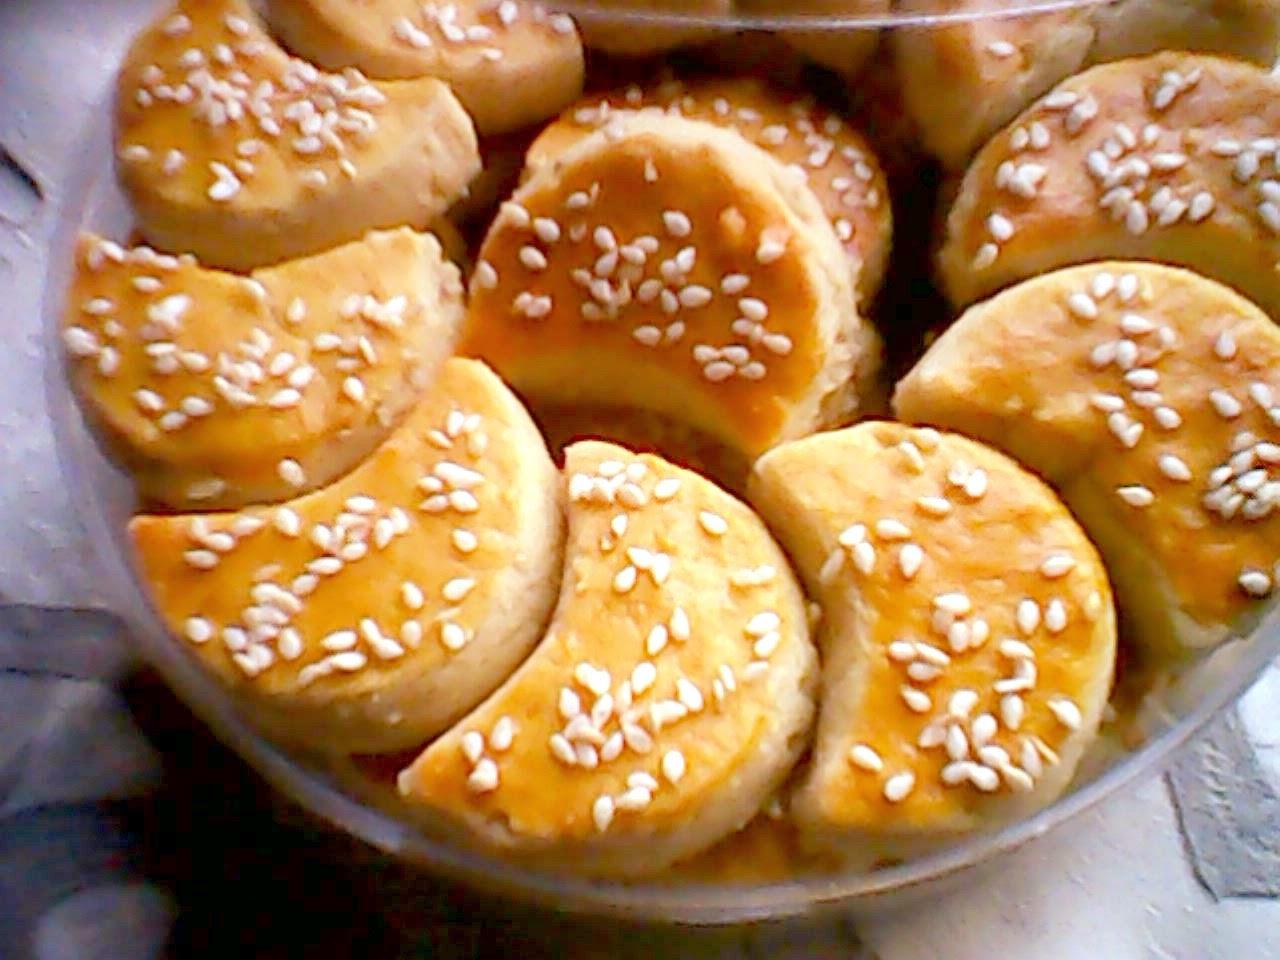 Resep Cara Membuat Kue Kering Kacang Almond Lebaran